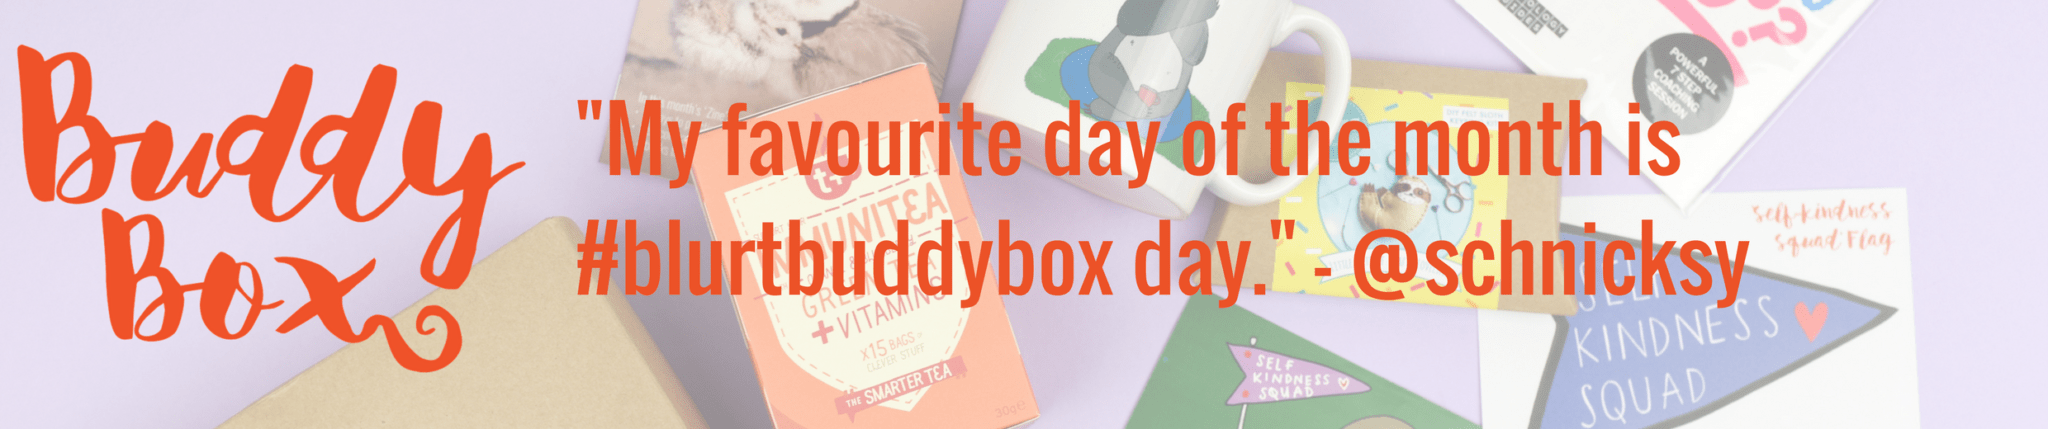 BuddyBox